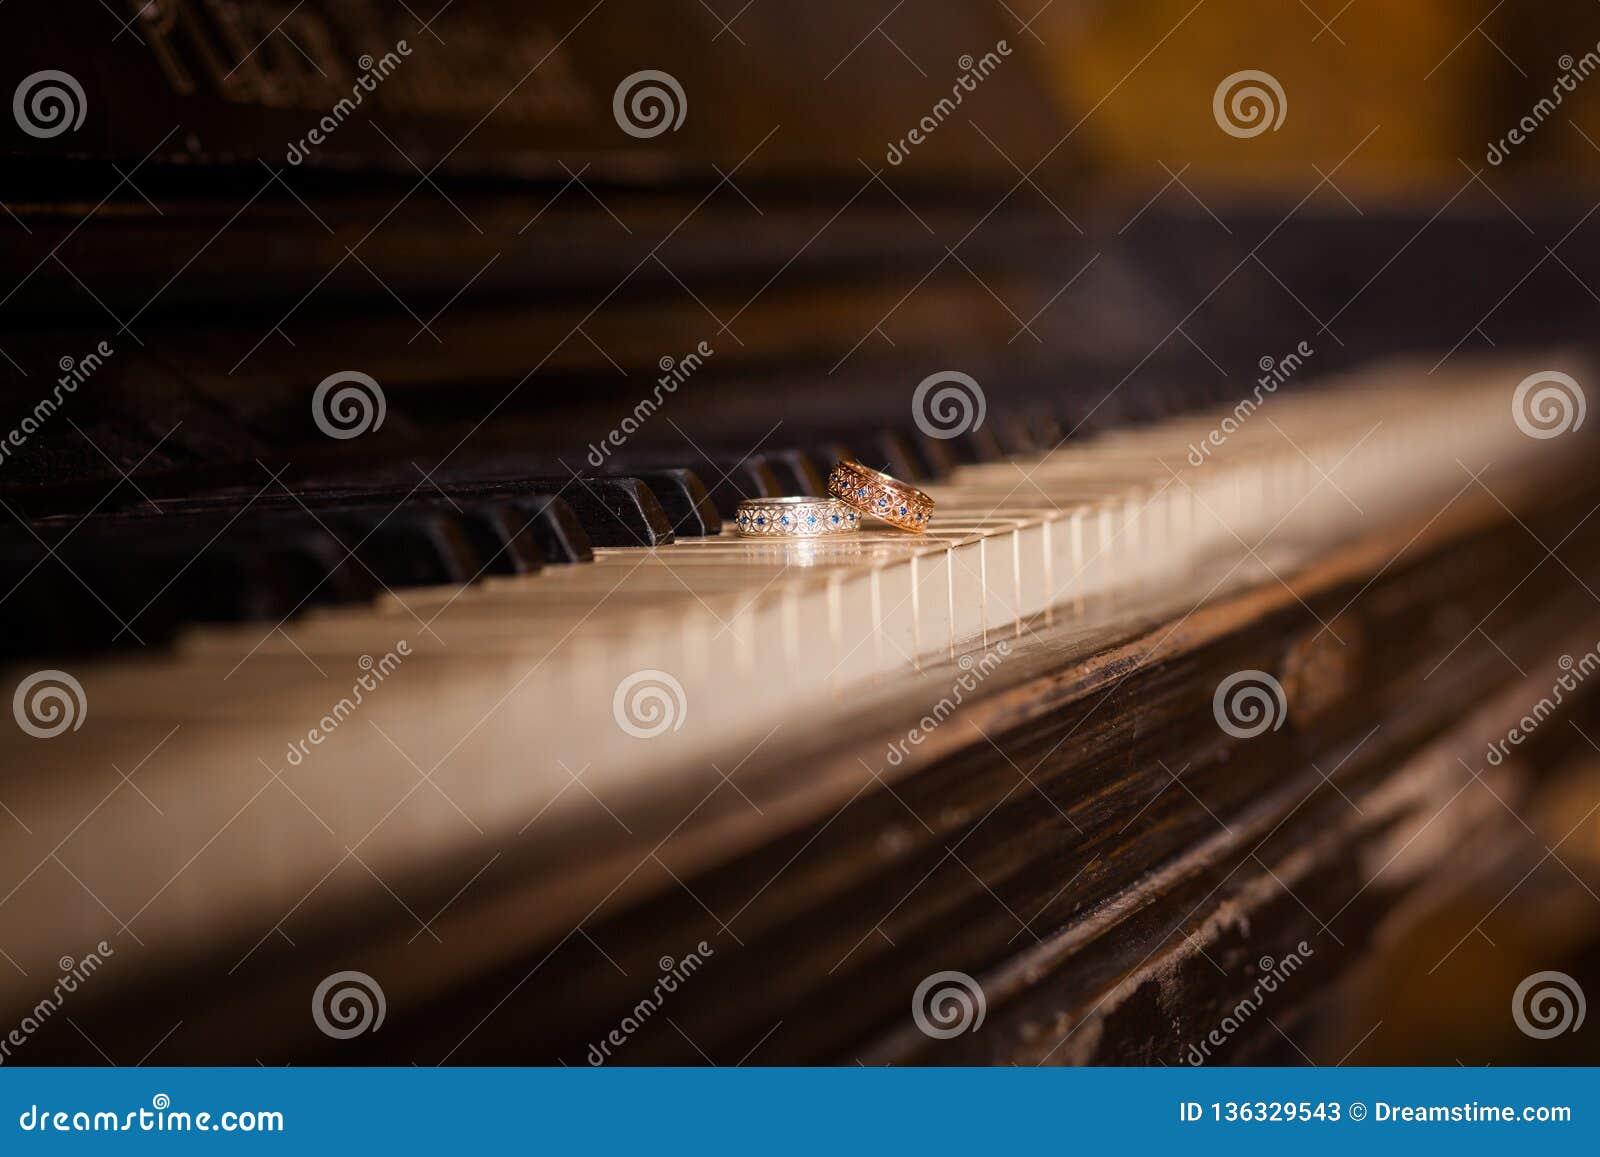 De trouwringen liggen op de pianosleutels